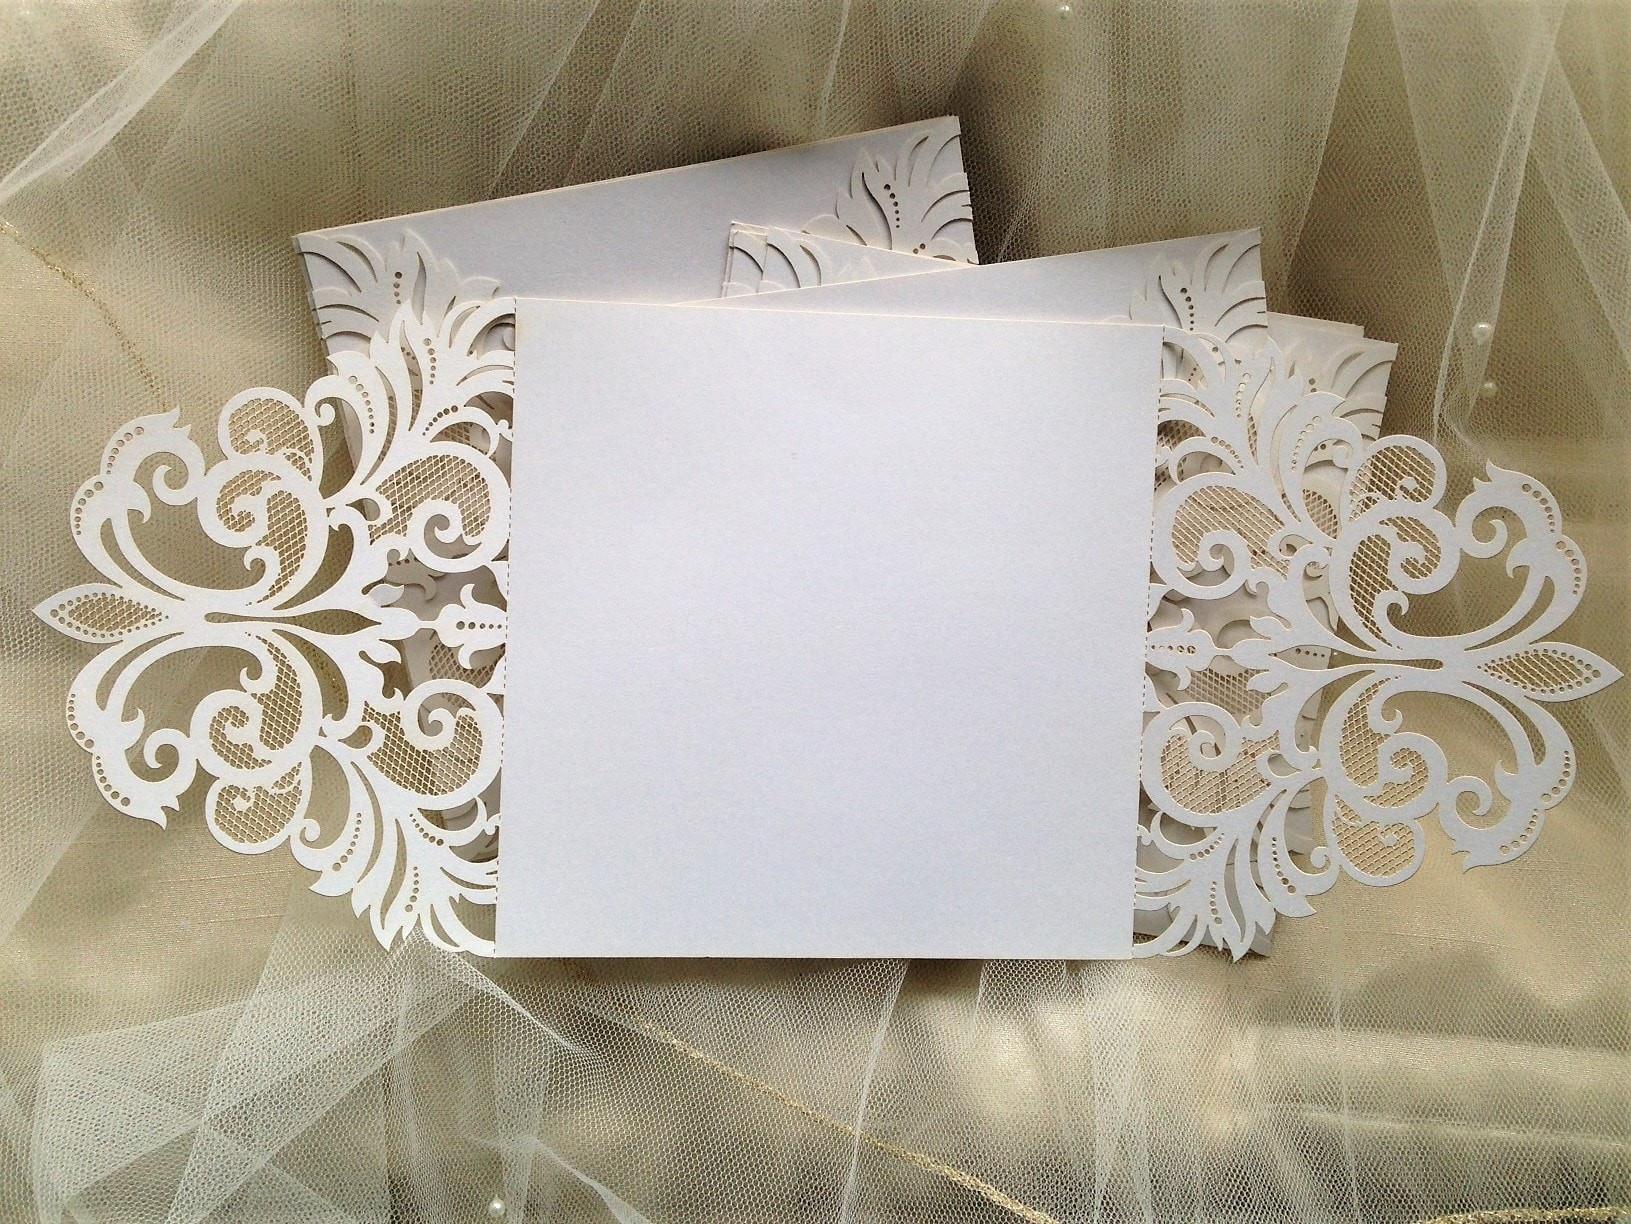 Best ideas about DIY Laser Cut Wedding Invitations . Save or Pin DIY Laser Cut Wedding Invitations £1 each DIY Wedding Invites Now.